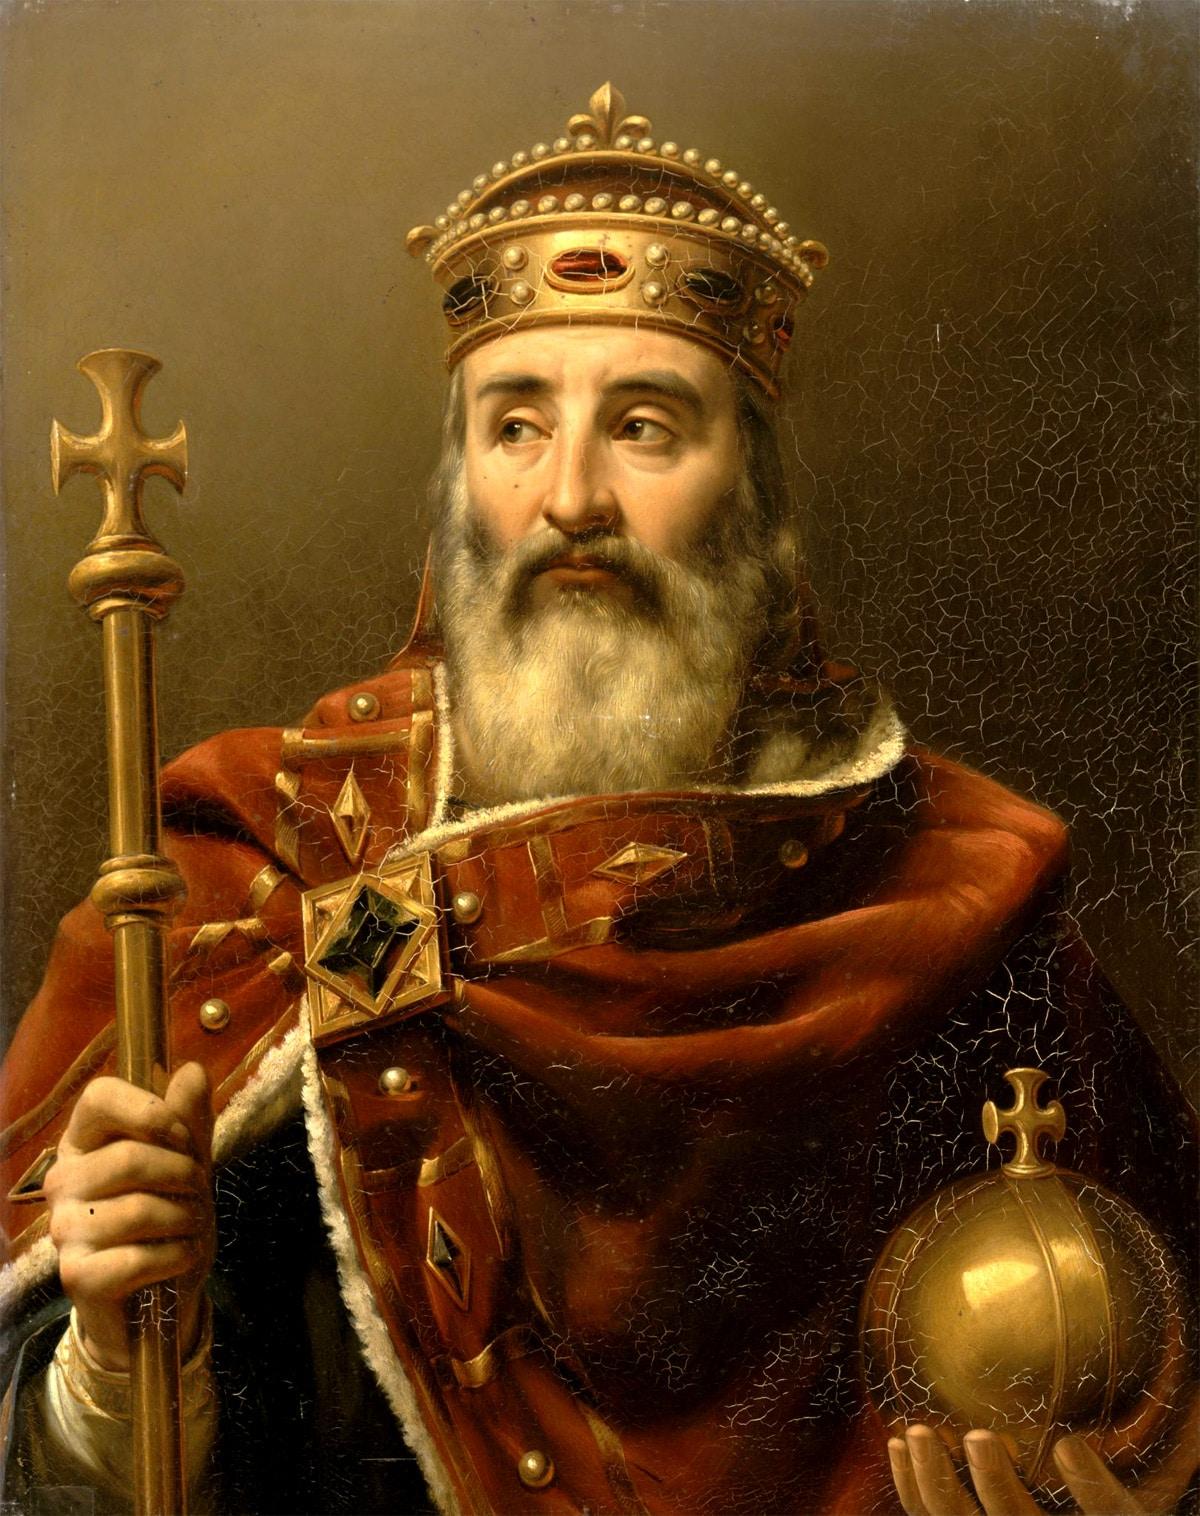 histoire_monde_medievale_france_nation_francaise_charlemagne